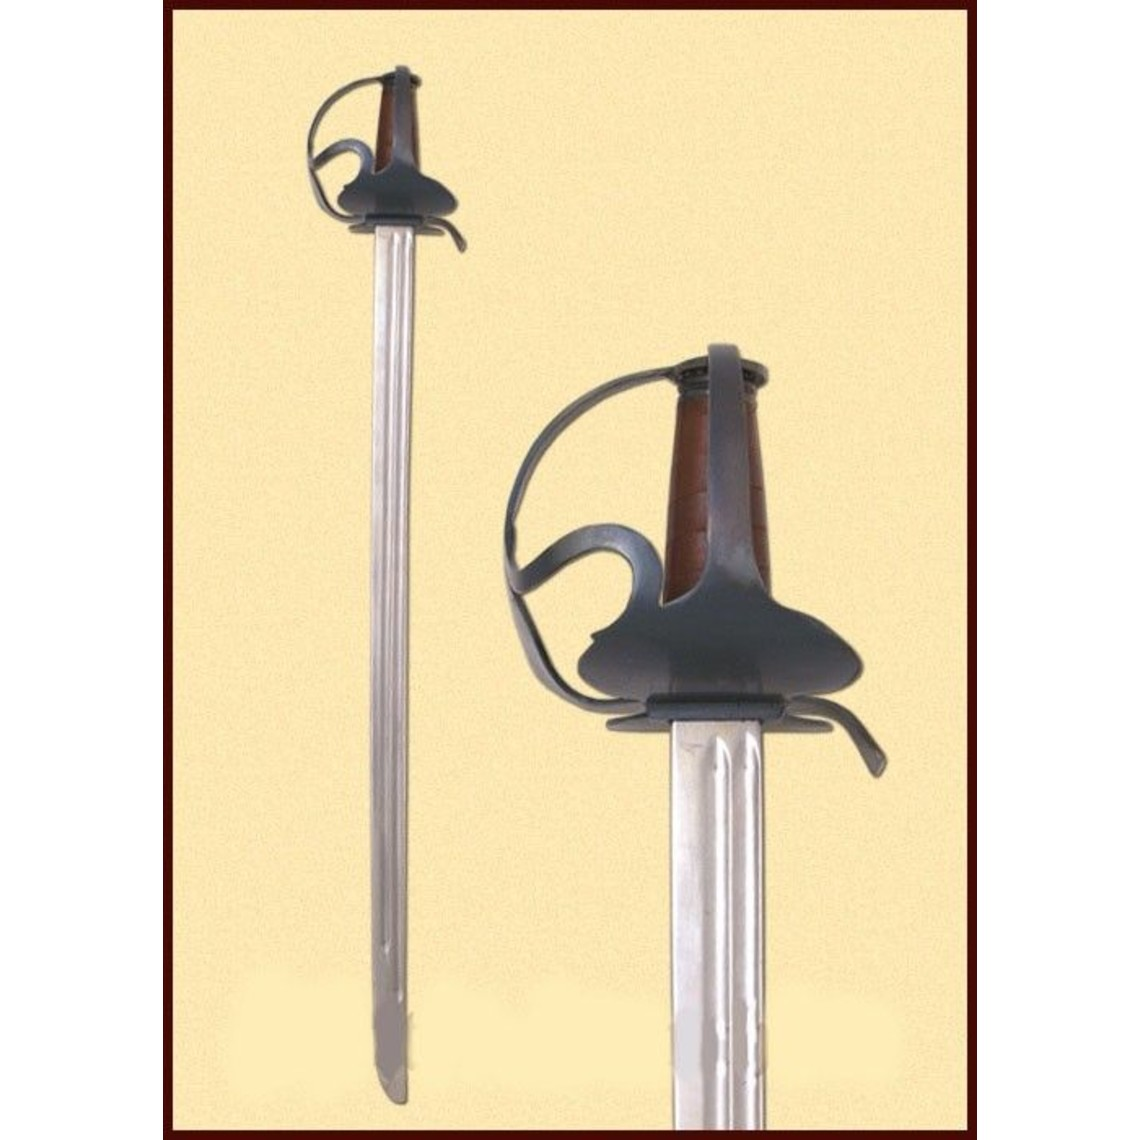 Armour Class Espada siglo 17 London Tower